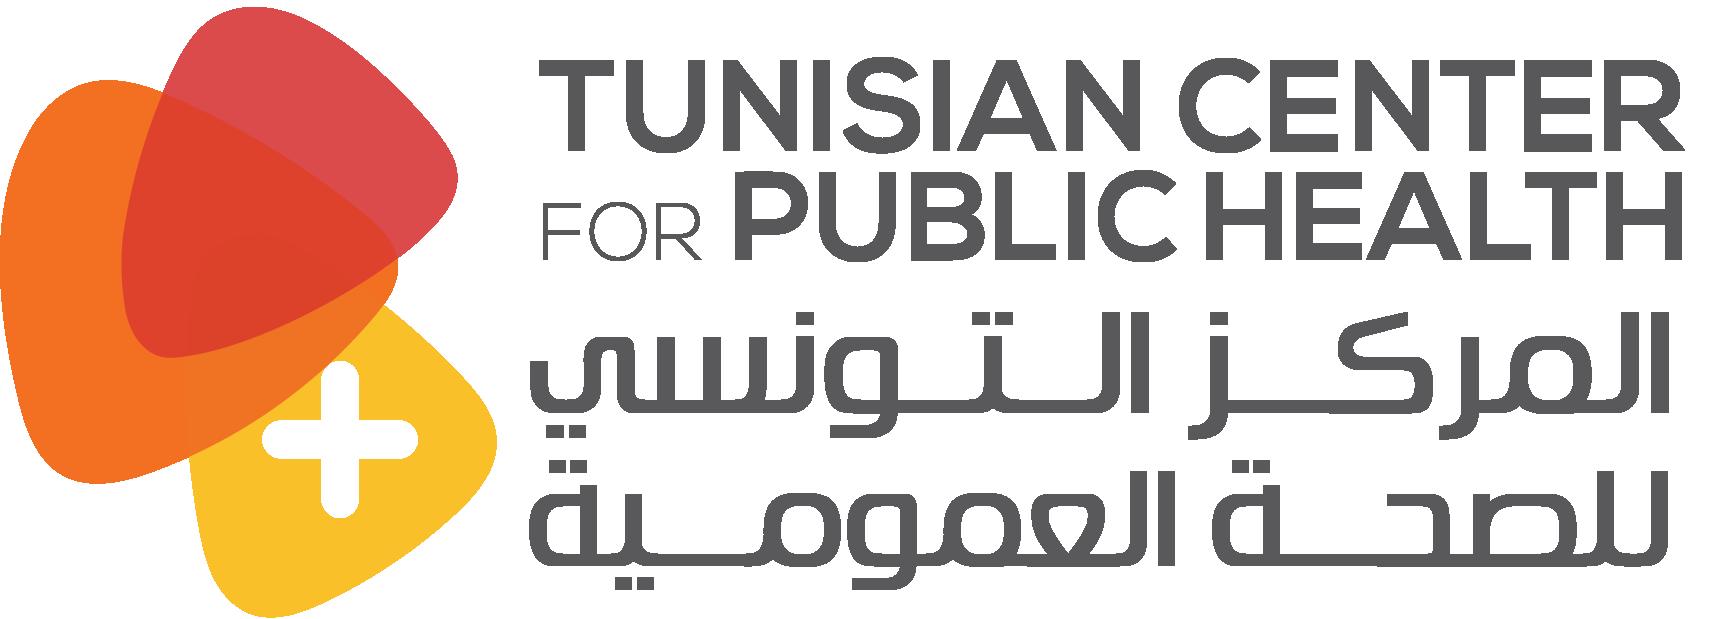 tunisian.png